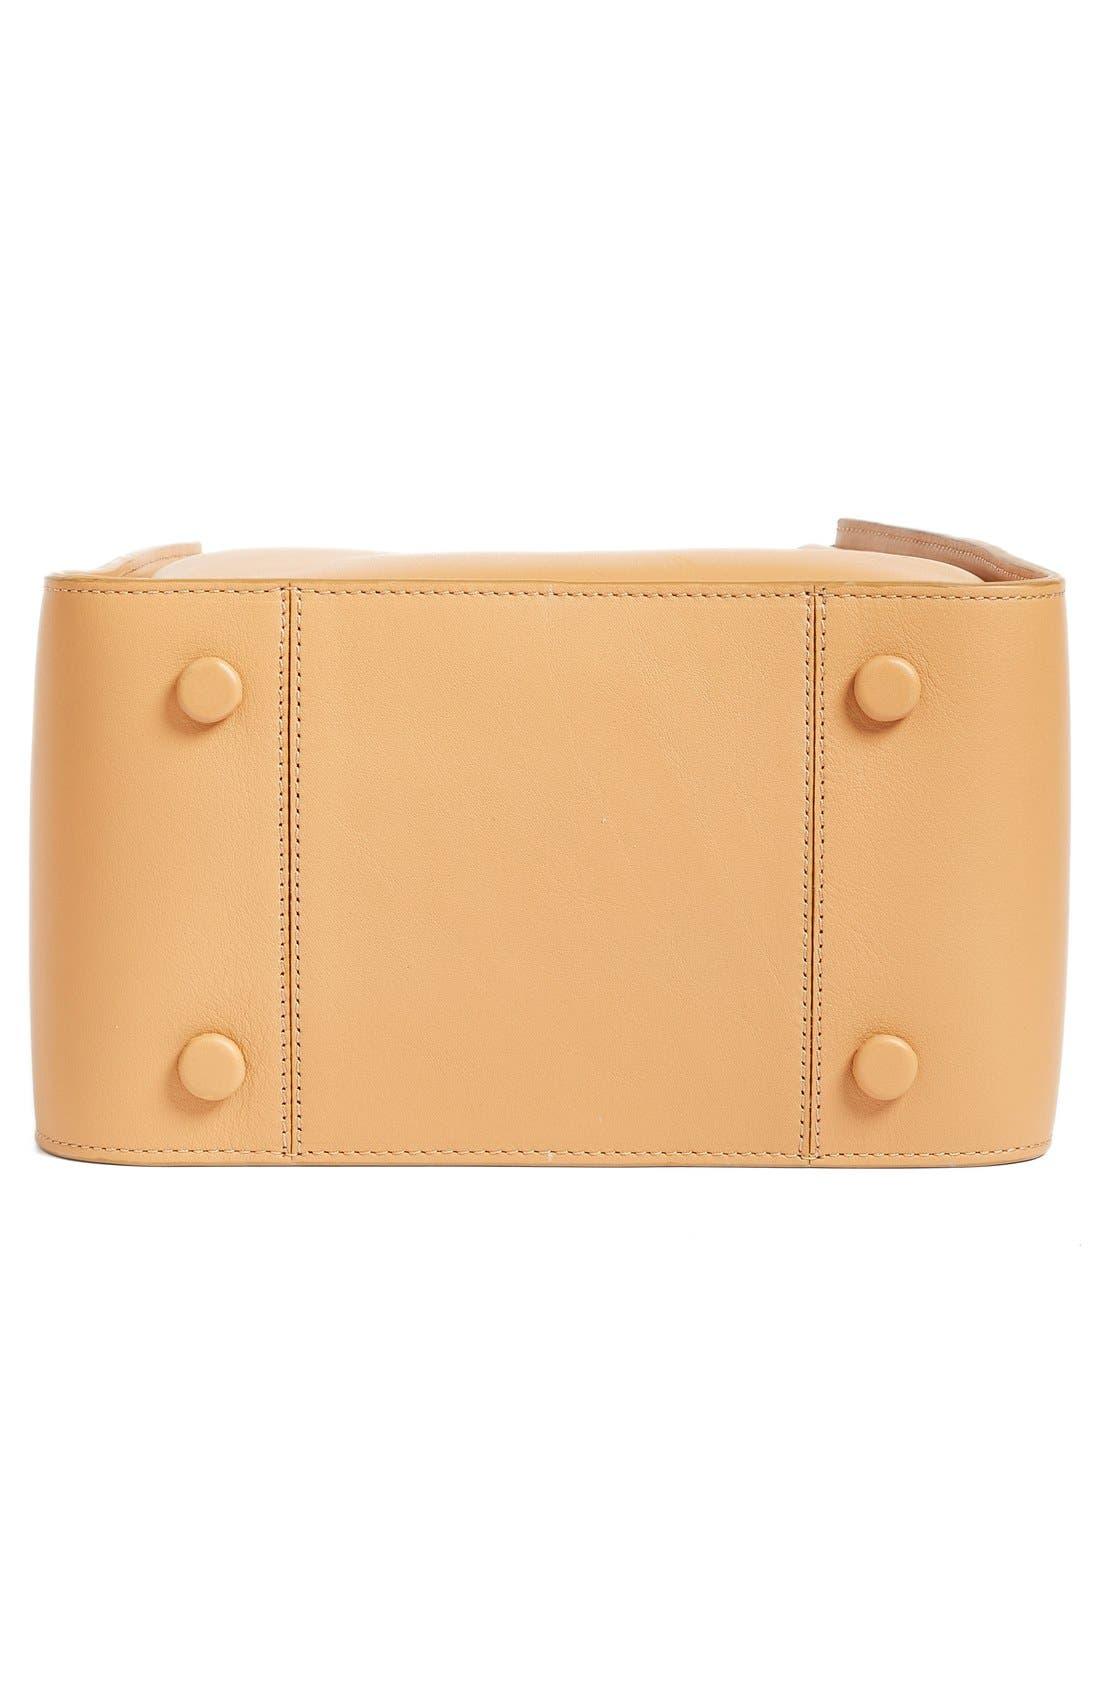 Mini Soleil Leather Bucket Bag,                             Alternate thumbnail 5, color,                             249